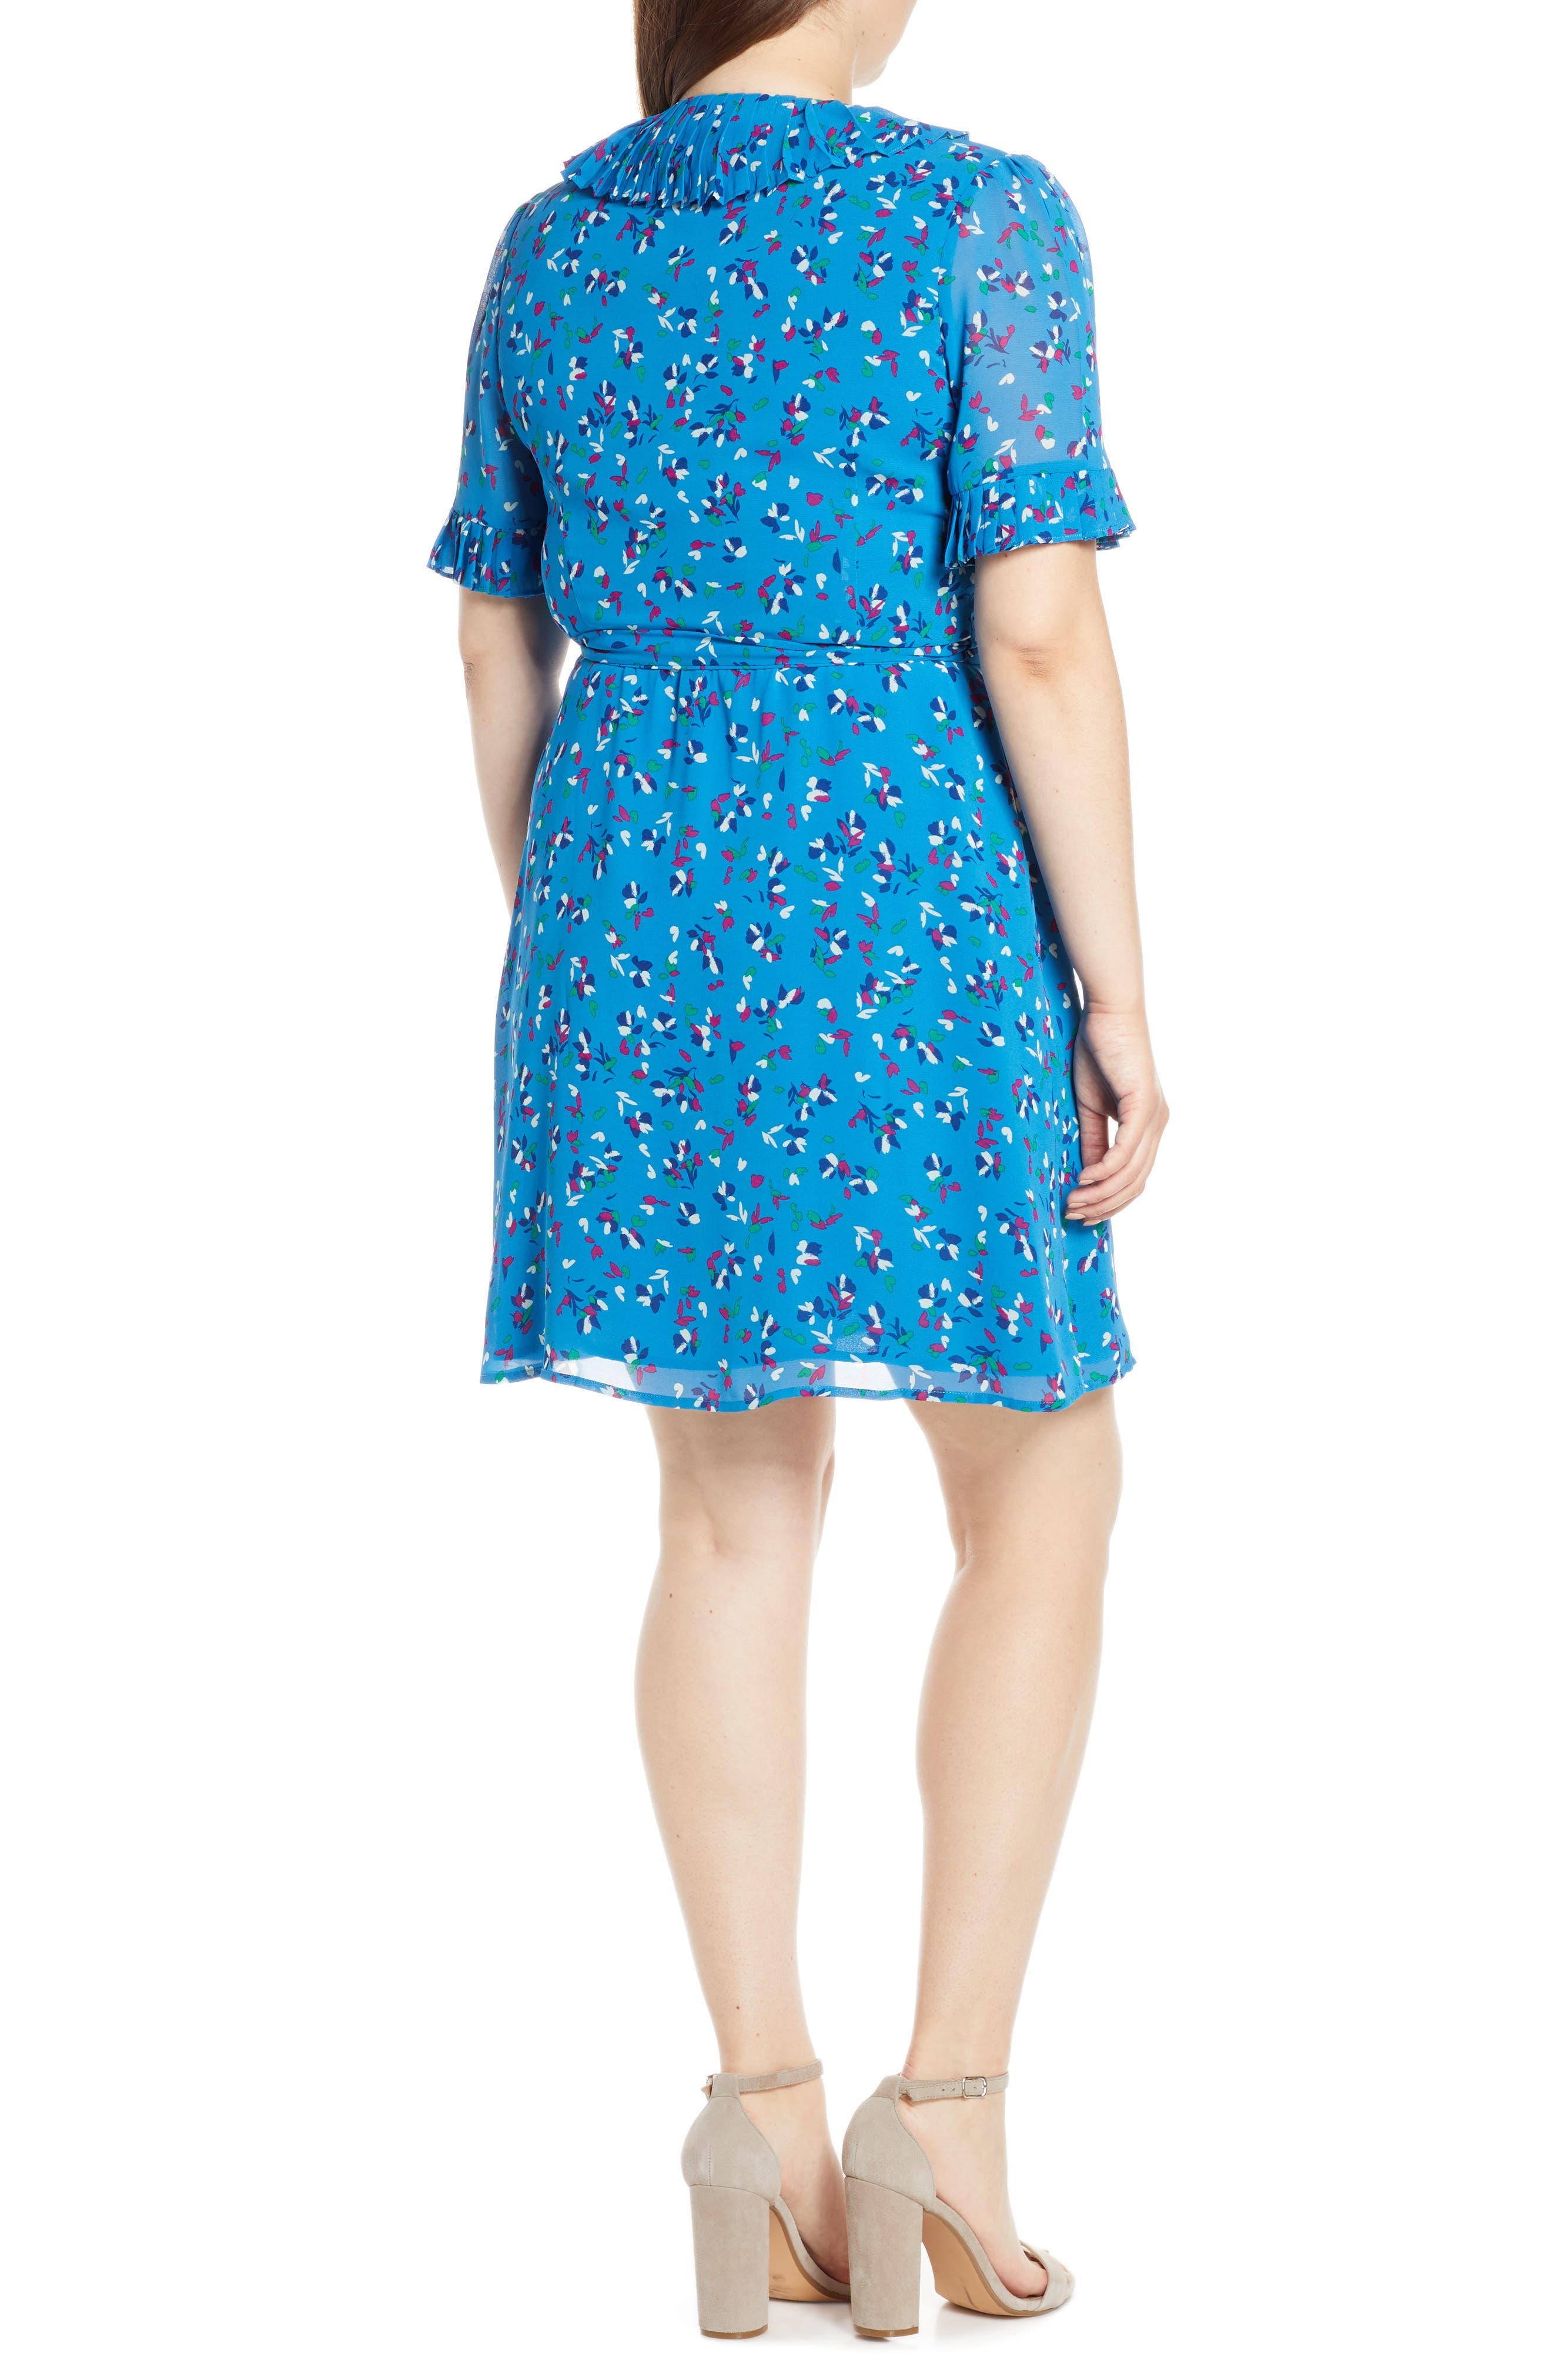 CHARLES HENRY, Pleat Neck Wrap Dress, Alternate thumbnail 9, color, BLUE FLORAL DITZY